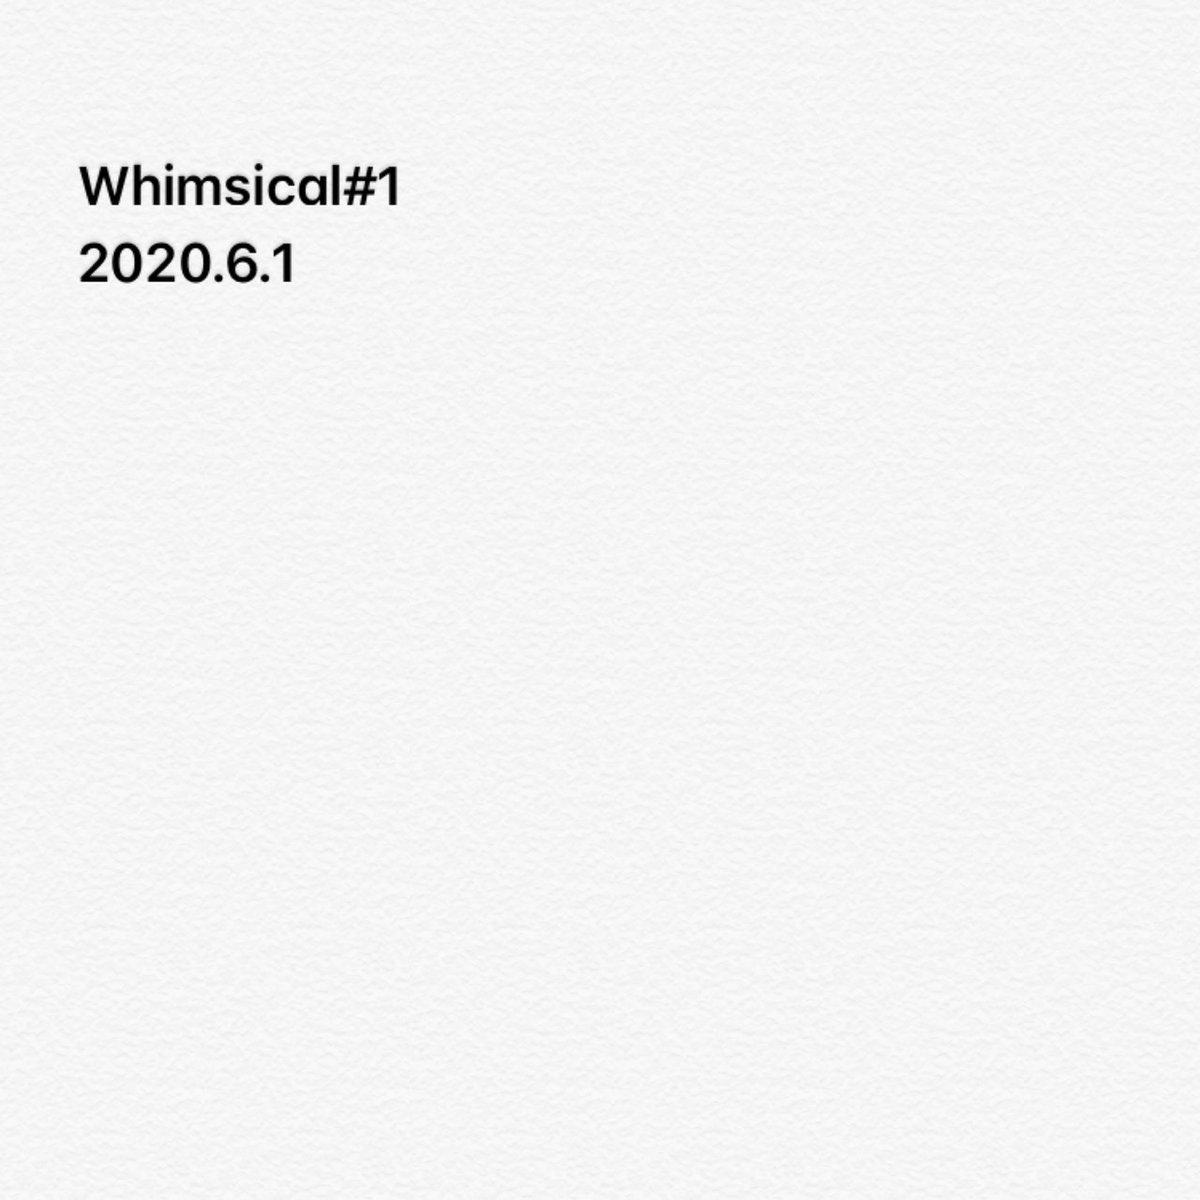 Spotifyにて「Whimsical #1」selected by hama_okamotoを公開しました!是非、聴いてみて下さい!@hama_okamoto